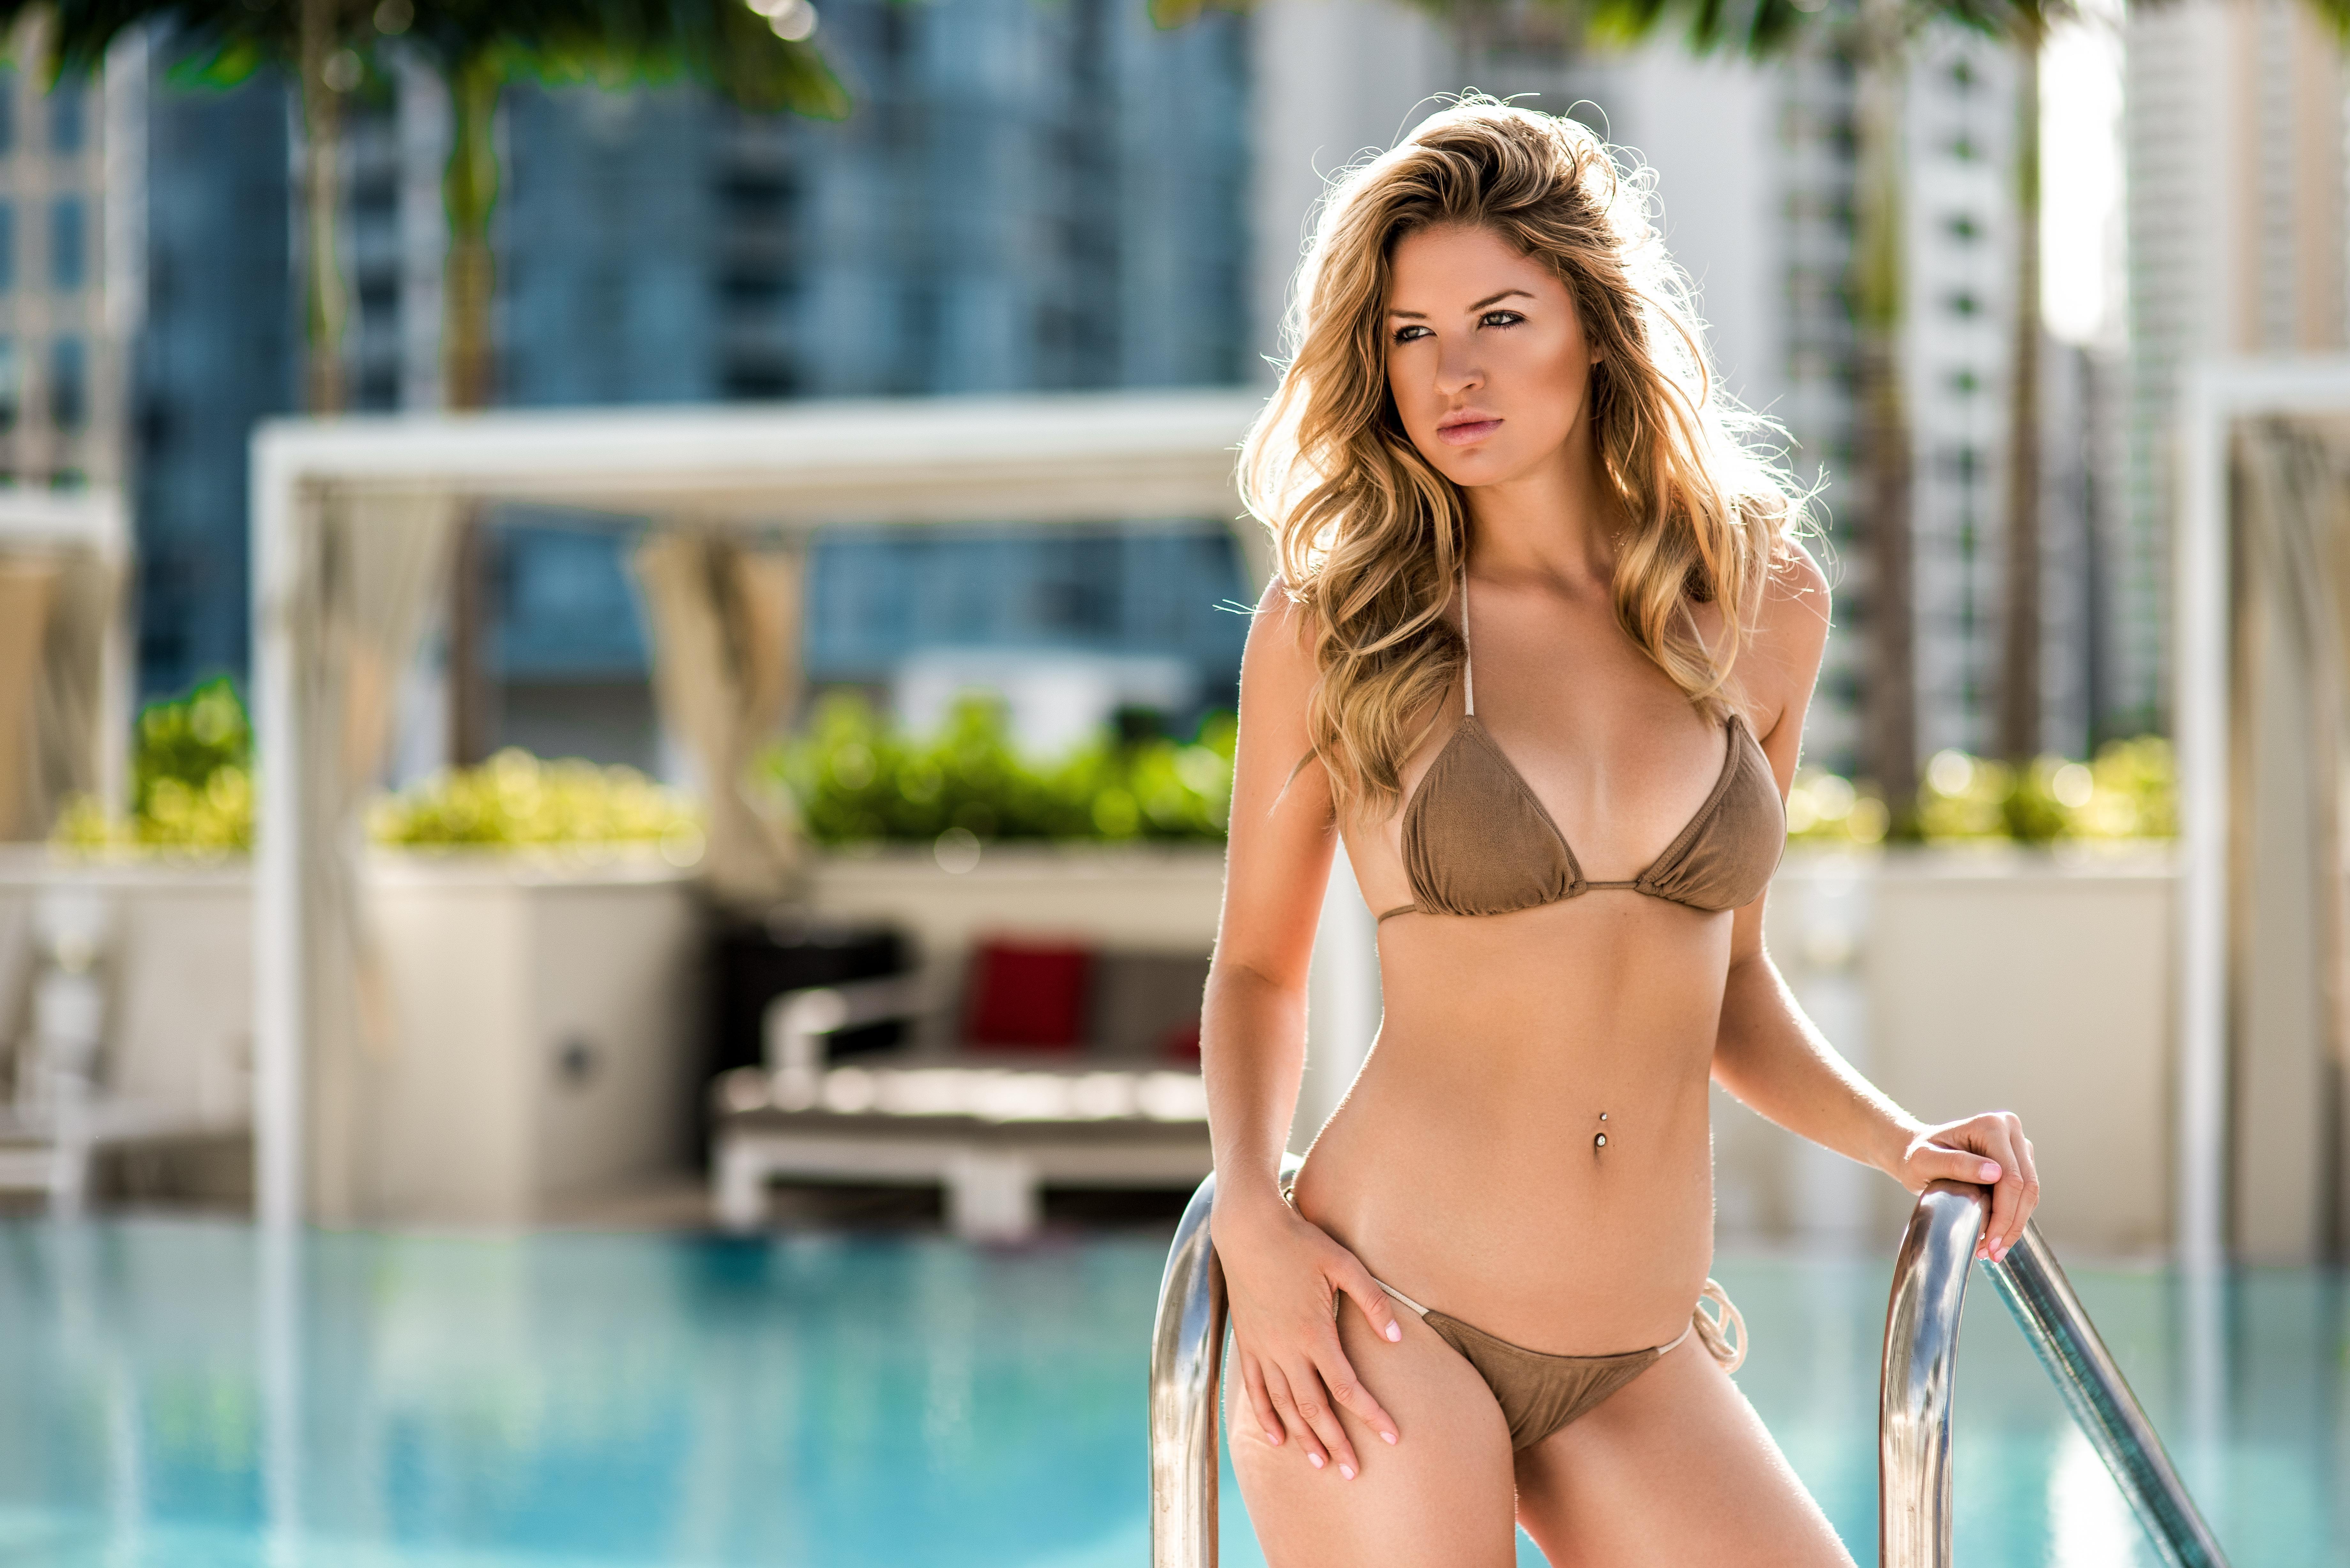 Wallpaper daily bikini